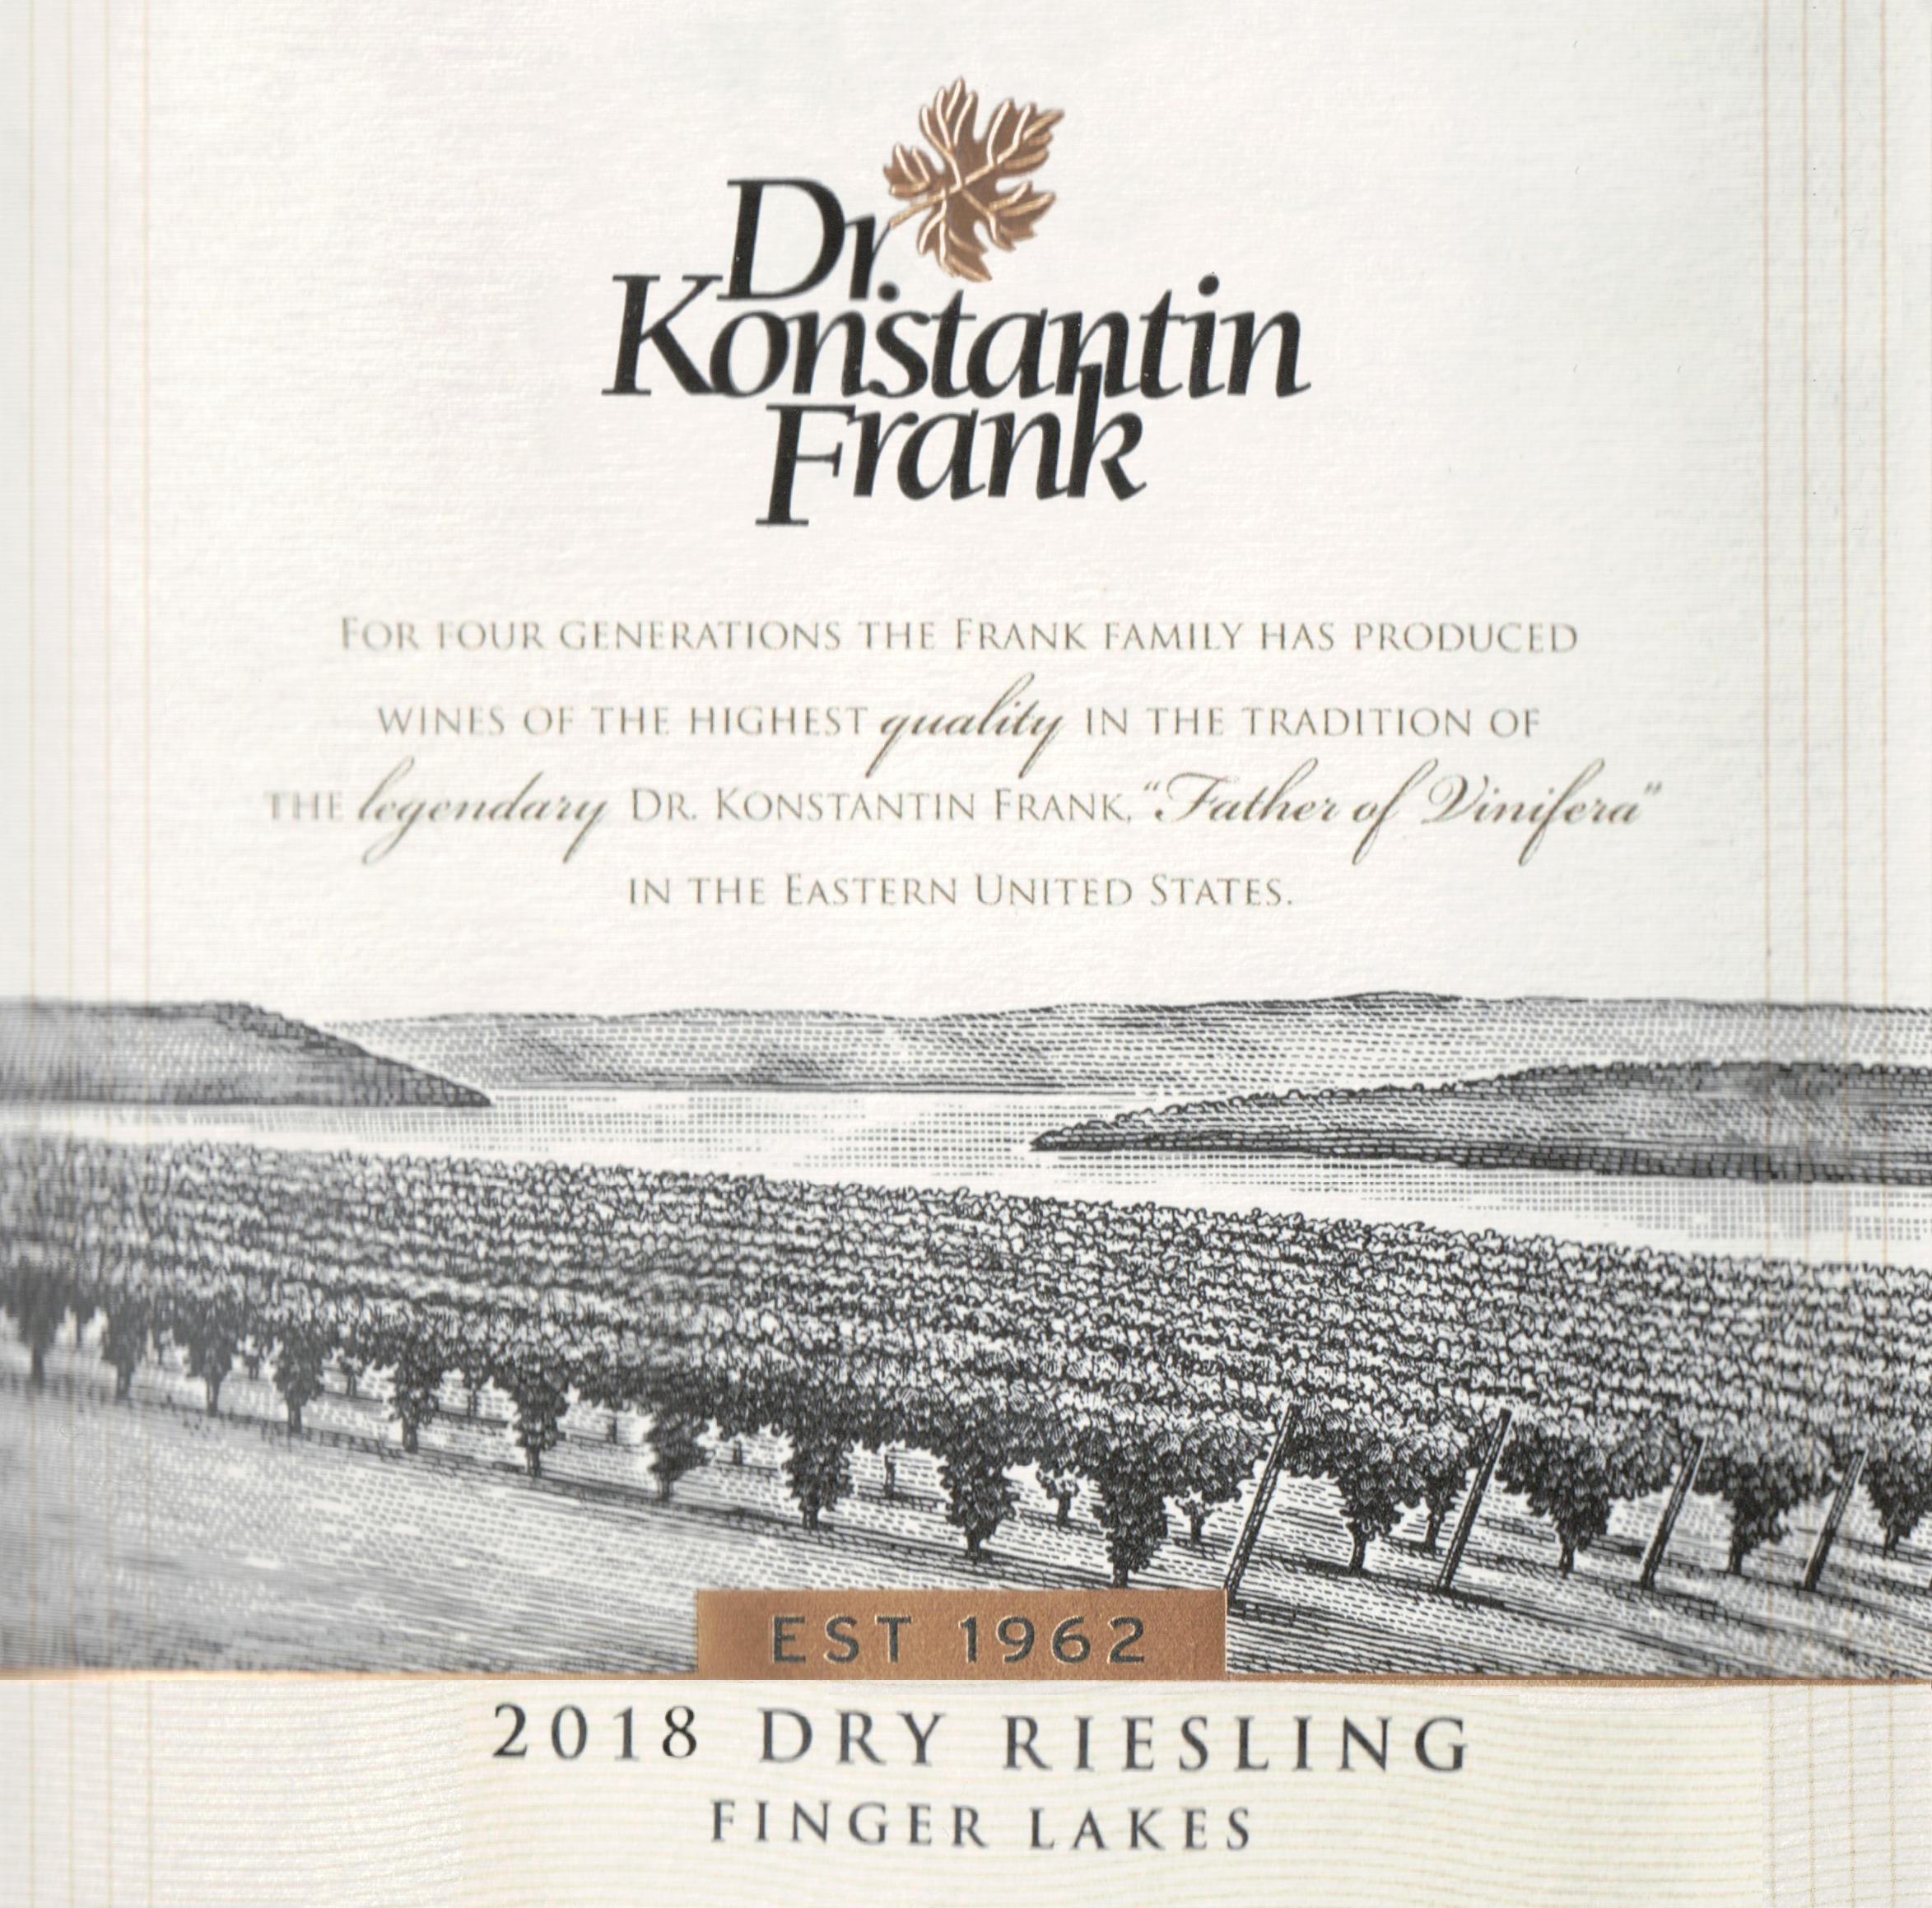 Dr. Konstantin Frank Riesling Dry 2018